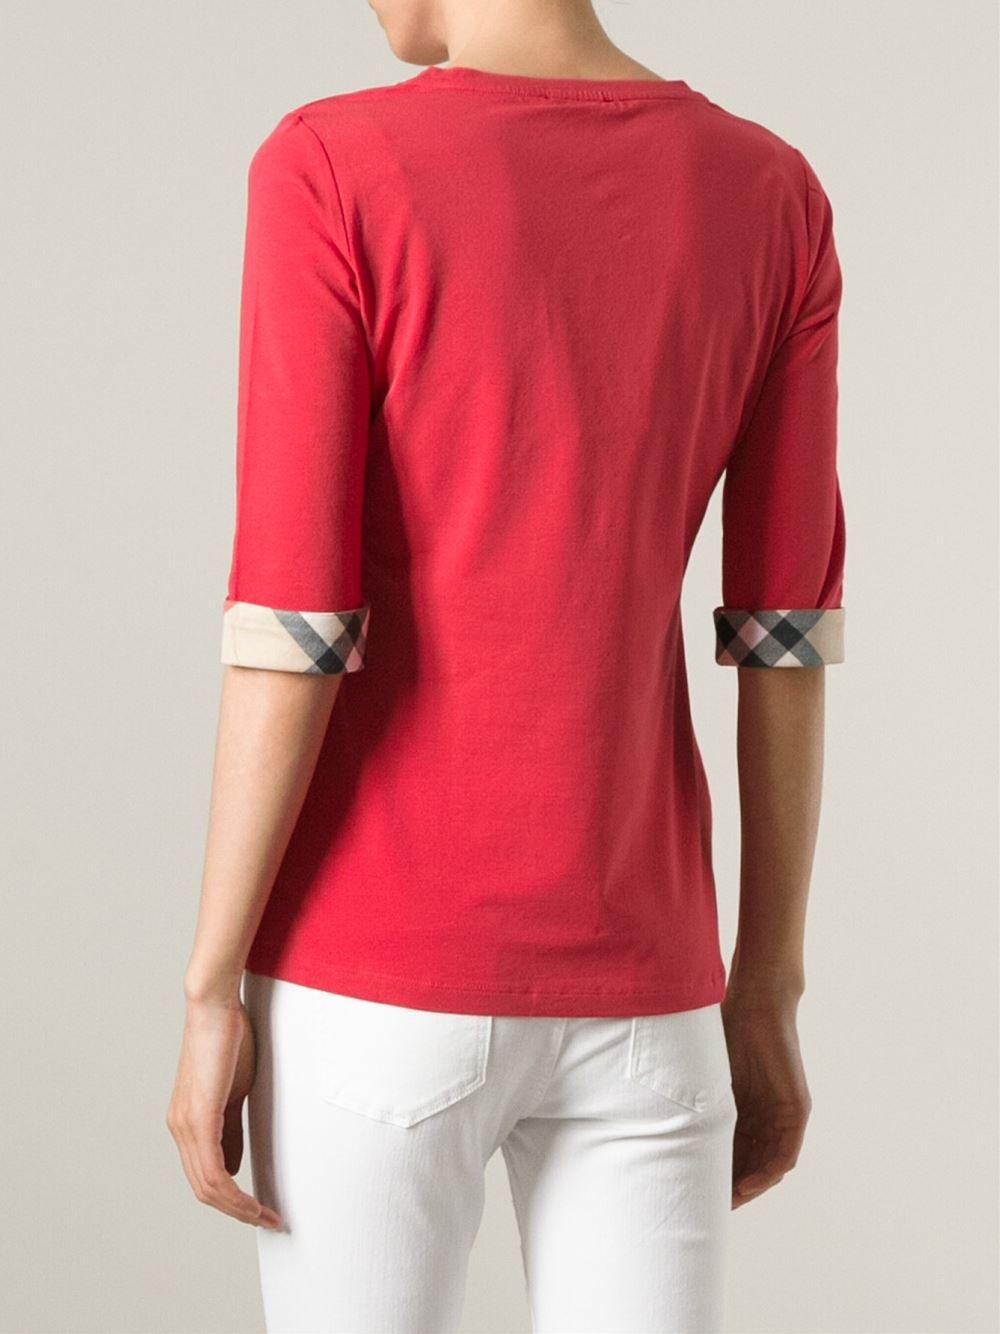 Lyst burberry brit three quarter length t shirt in pink for Three quarter length shirt